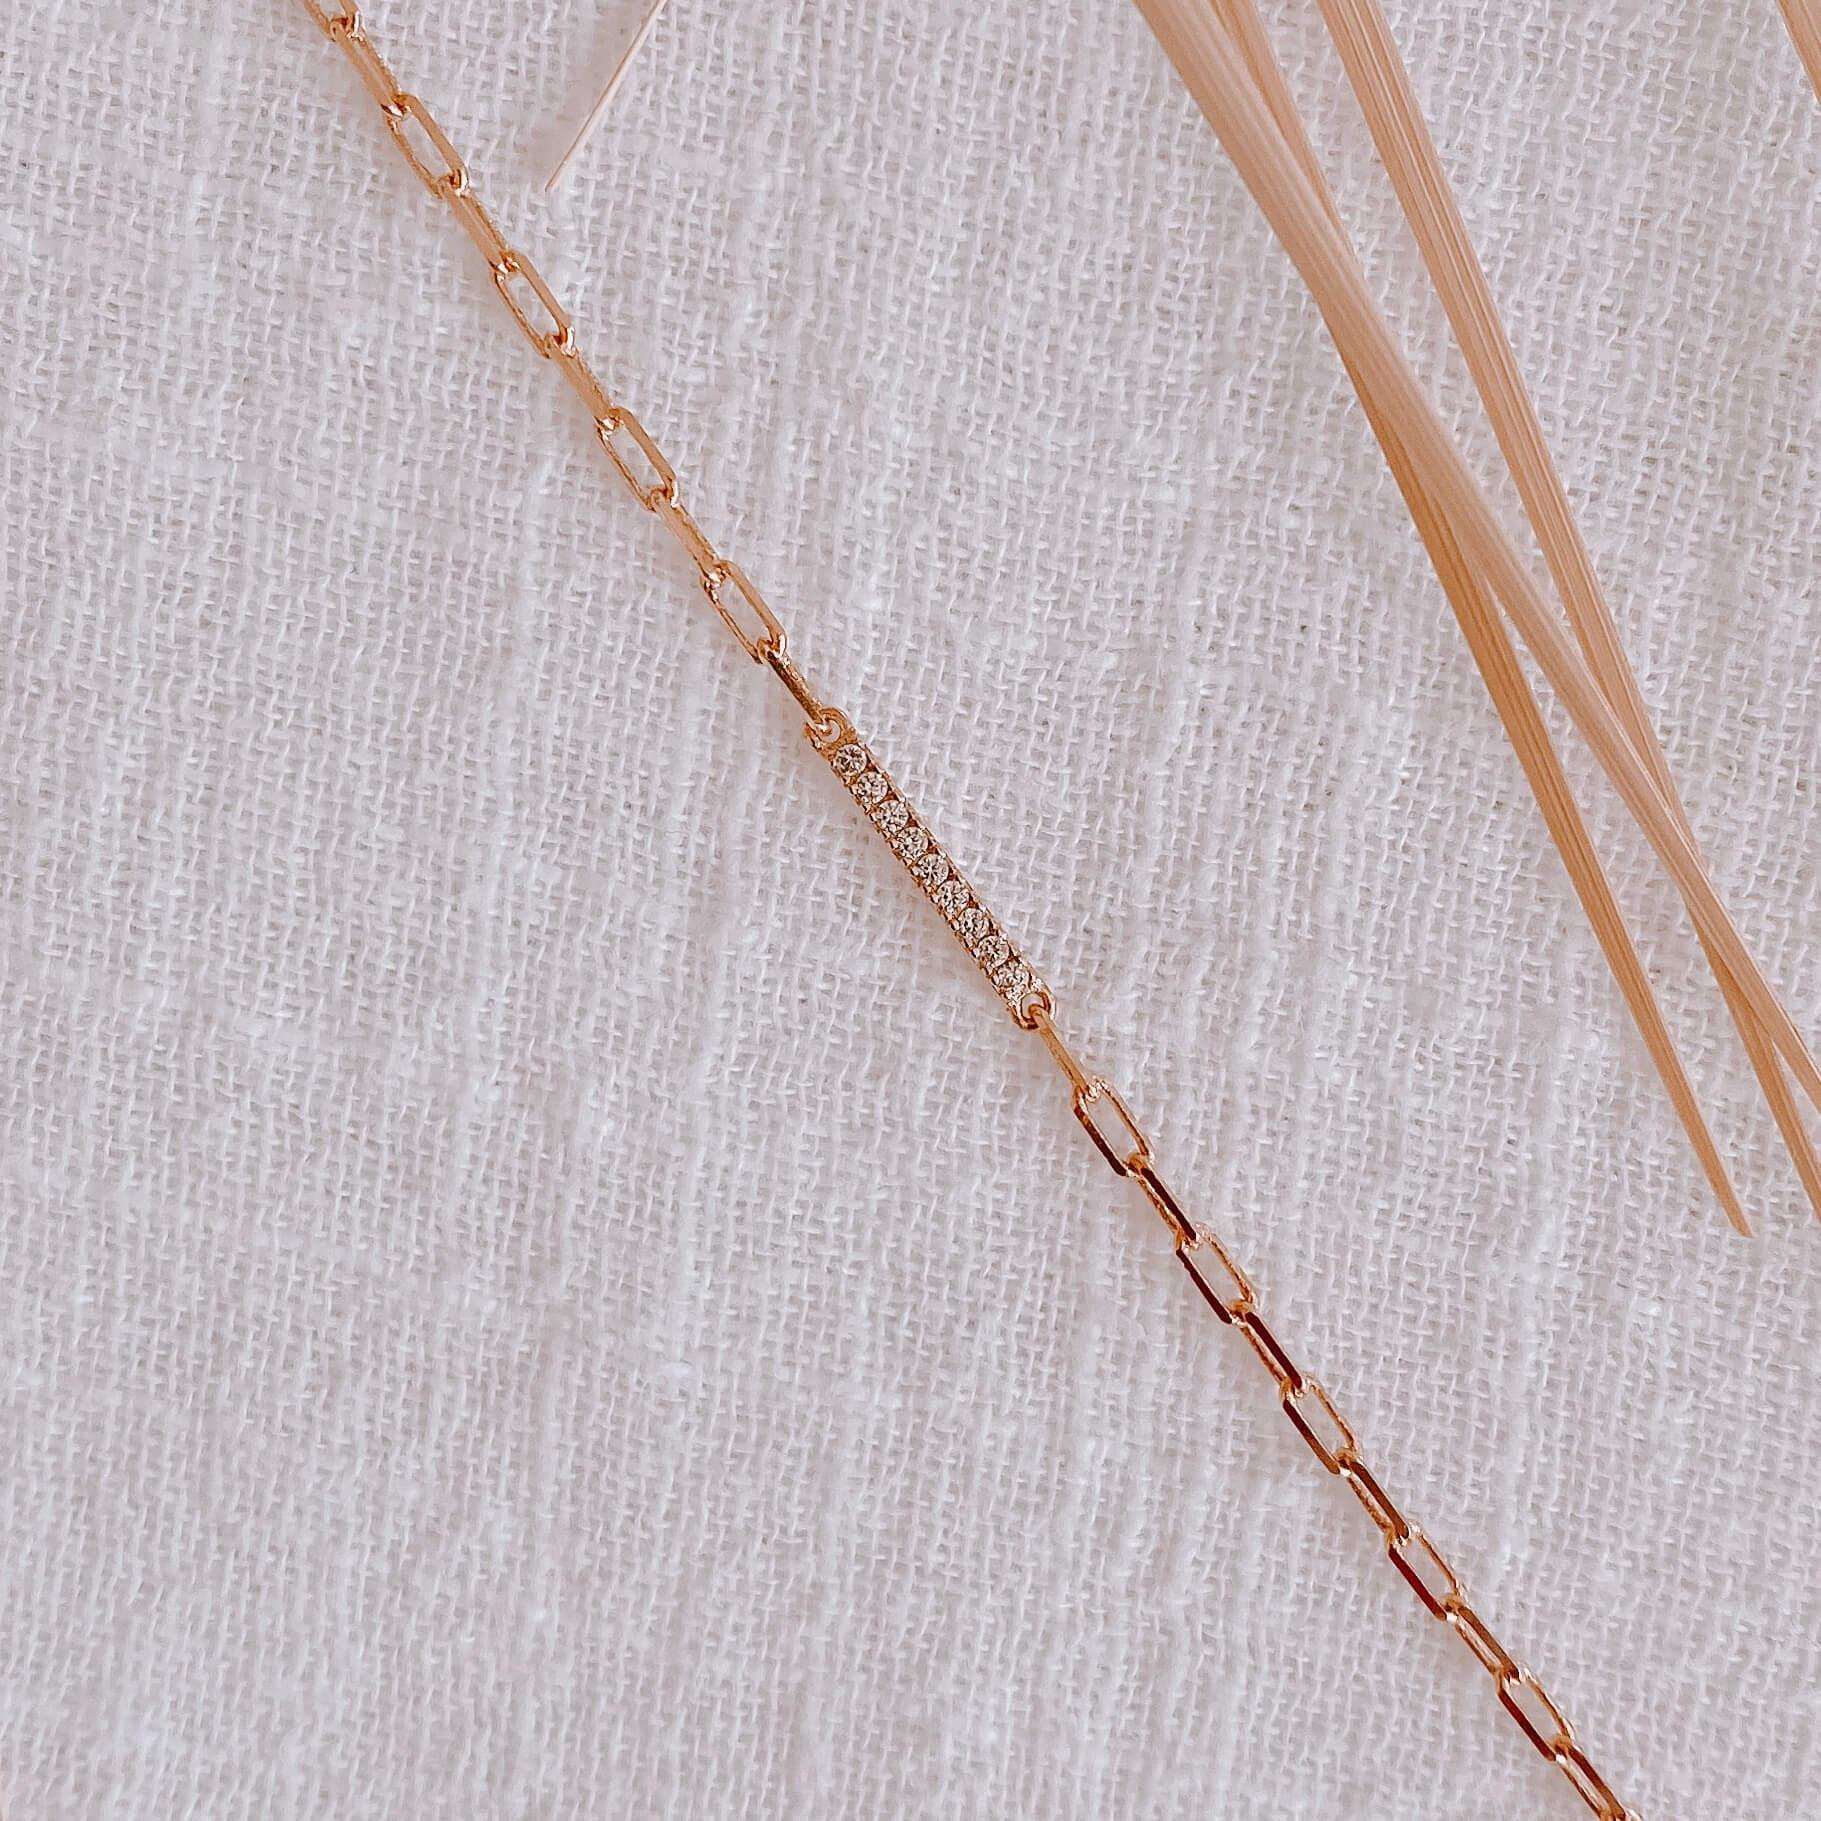 Bracelet Clémentine - Cénélia